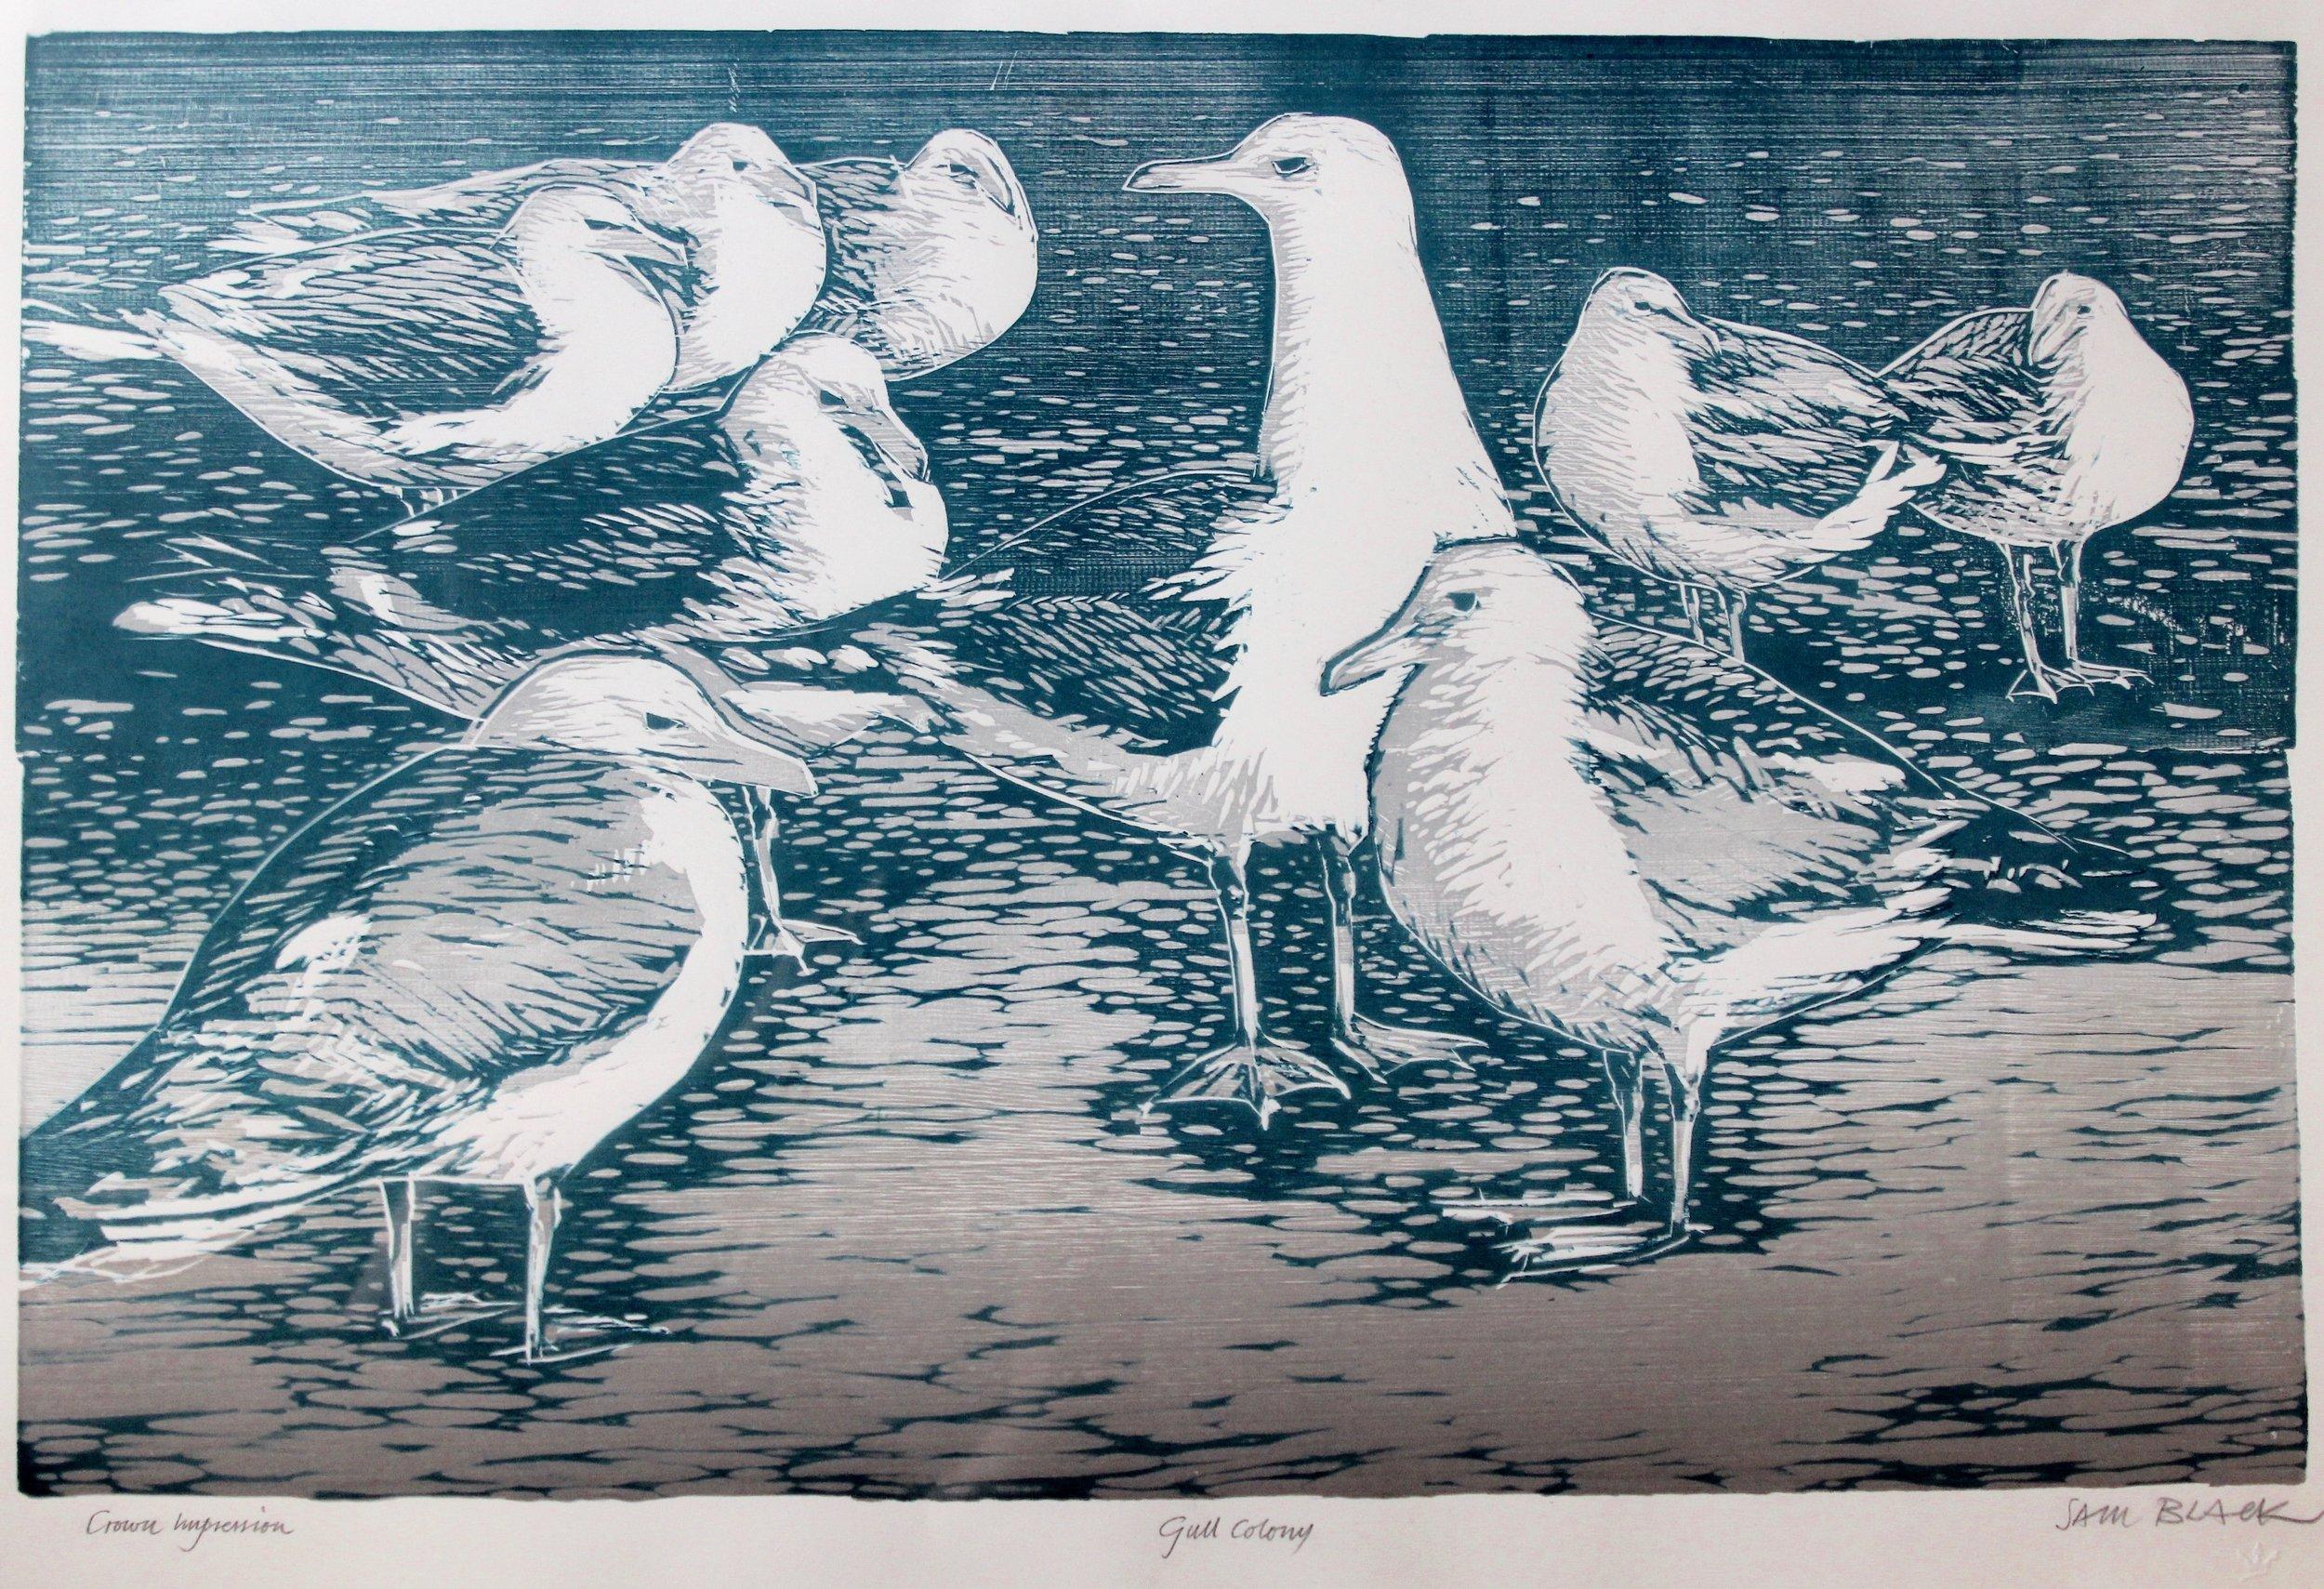 Sam Black, Gull Colony